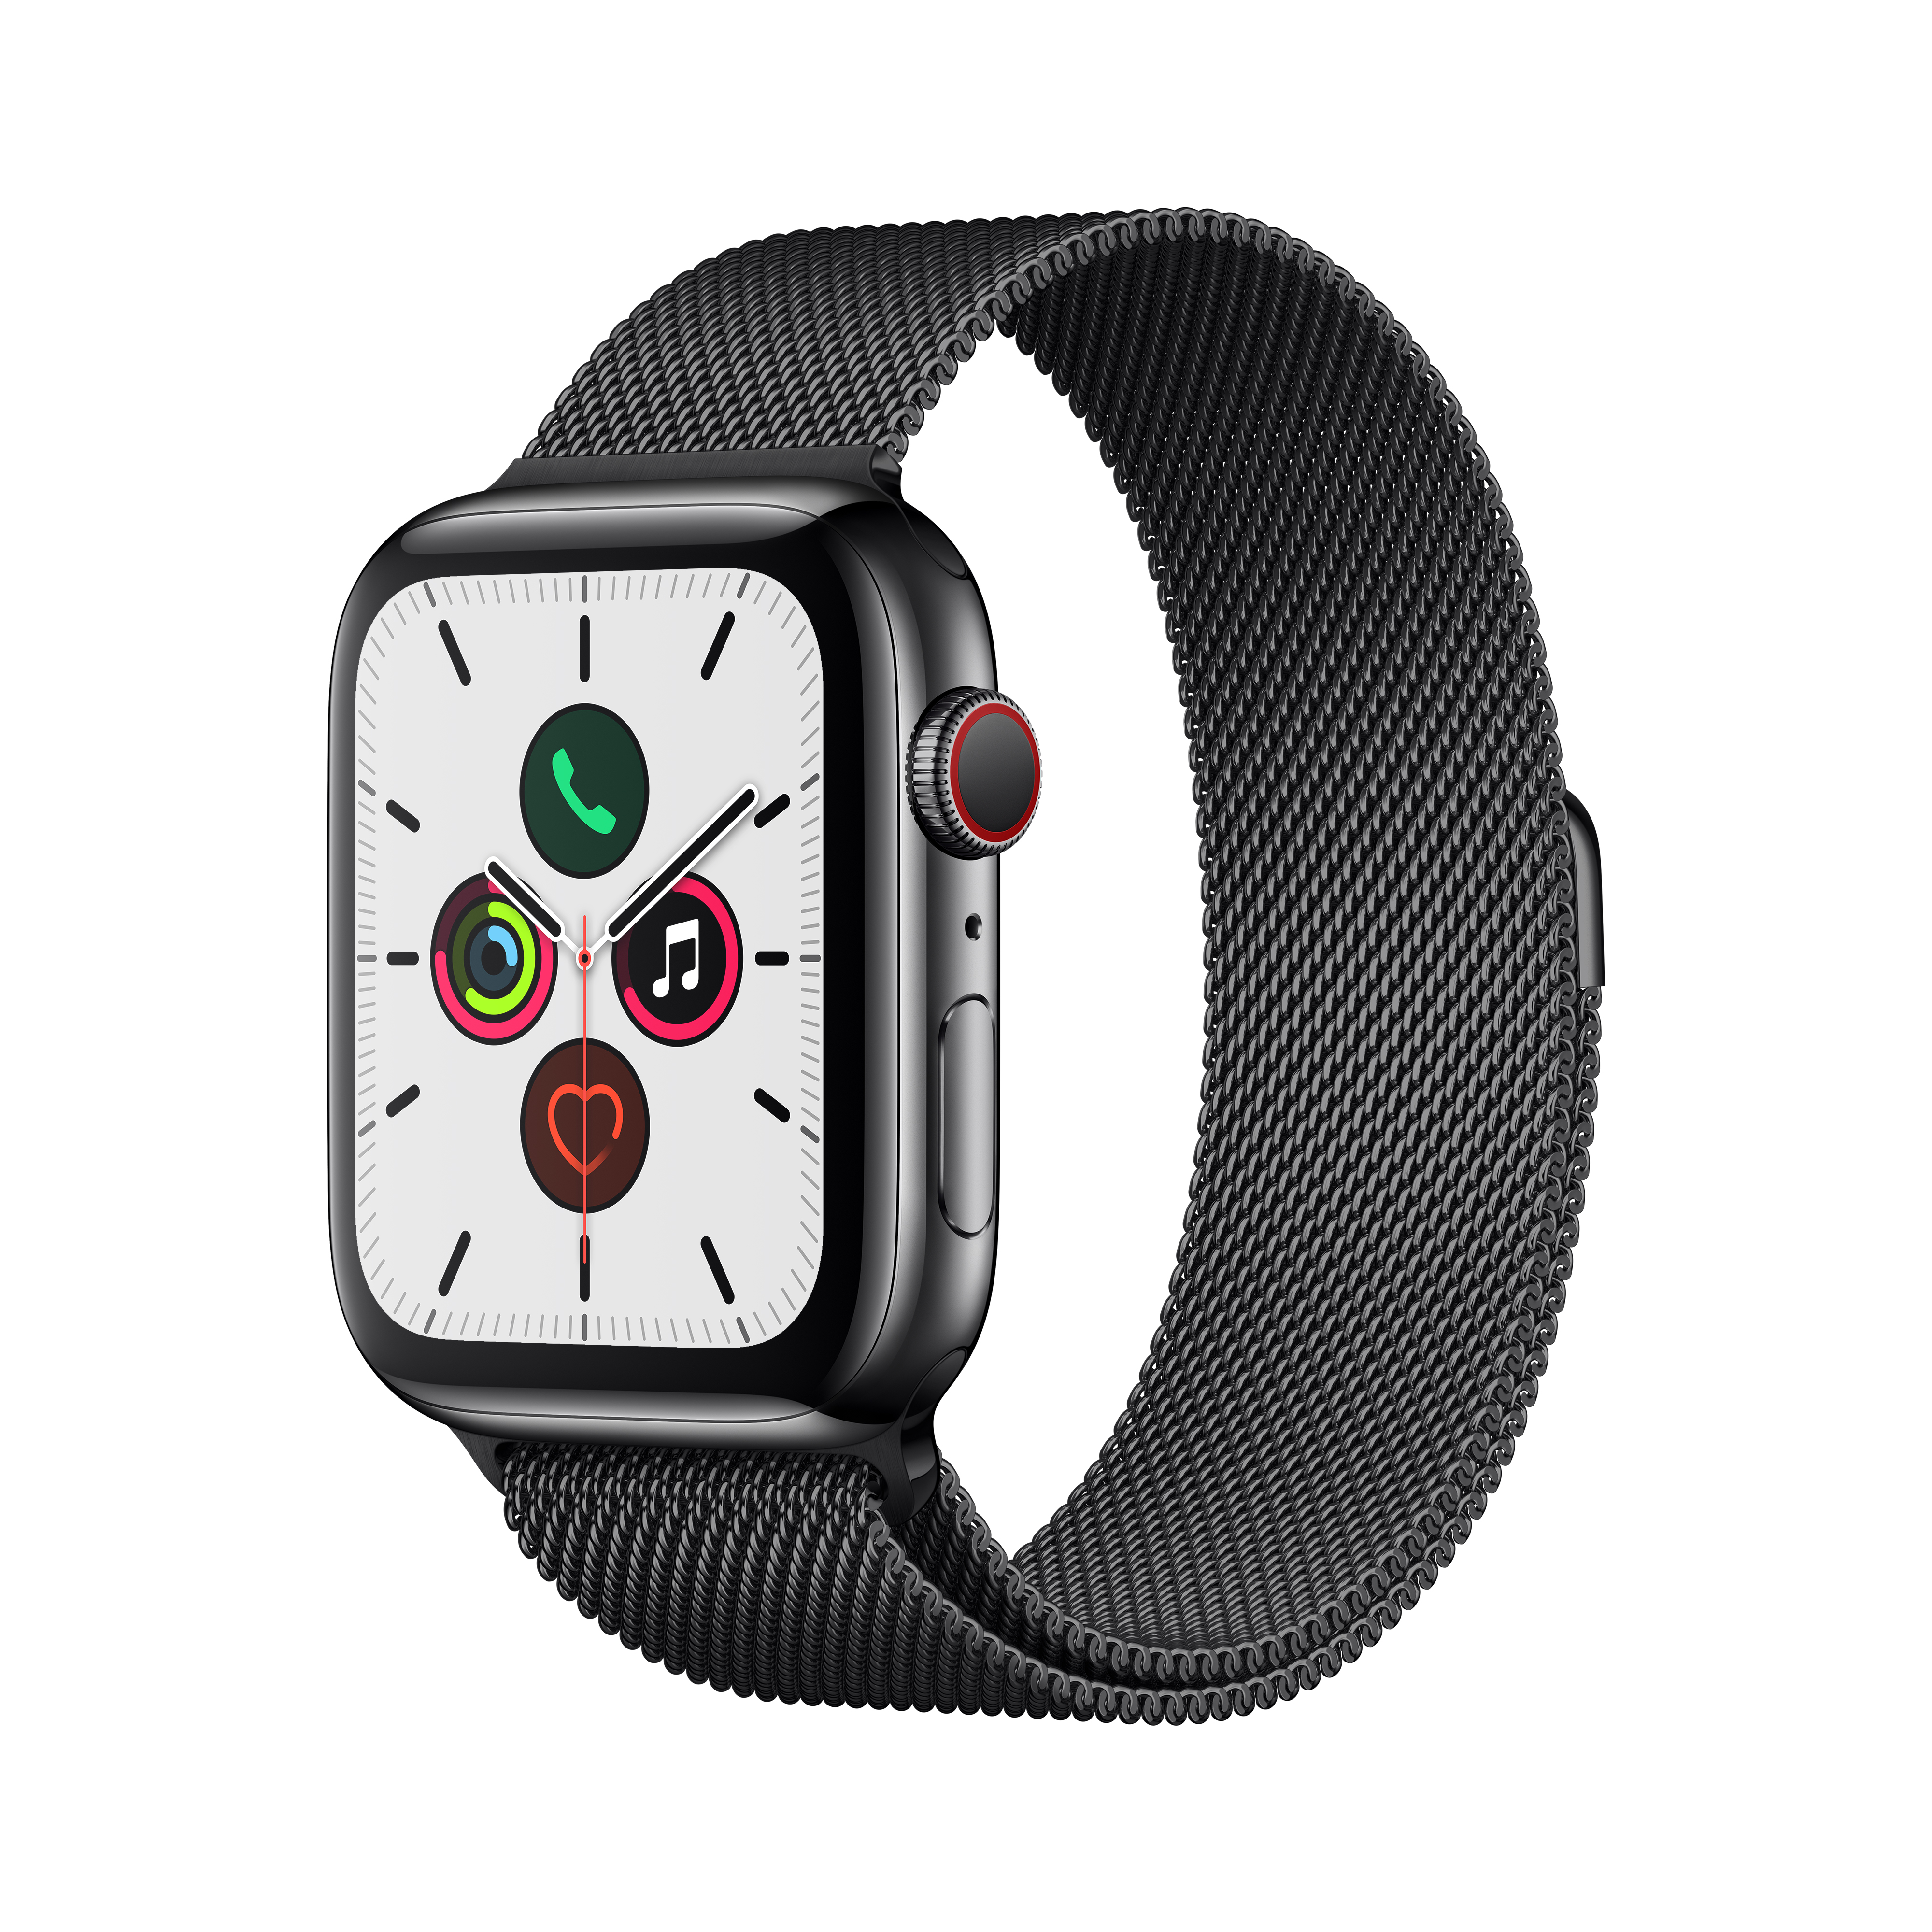 Apple 애플워치5 GPS + 셀룰러 44mm 밀레니즈 루프 + 스테인리스스틸 케이스, 스페이스 블랙(MWWL2KH/A), 스페이스 블랙(루프)